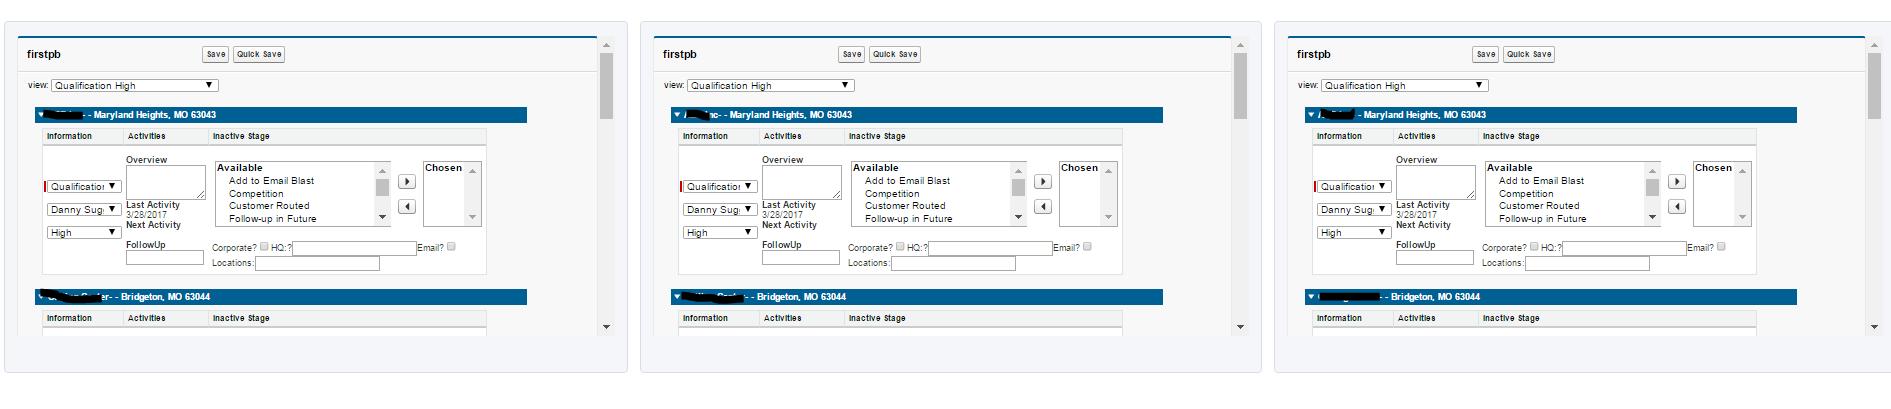 adjust margin/padding around visualforce page in lightning